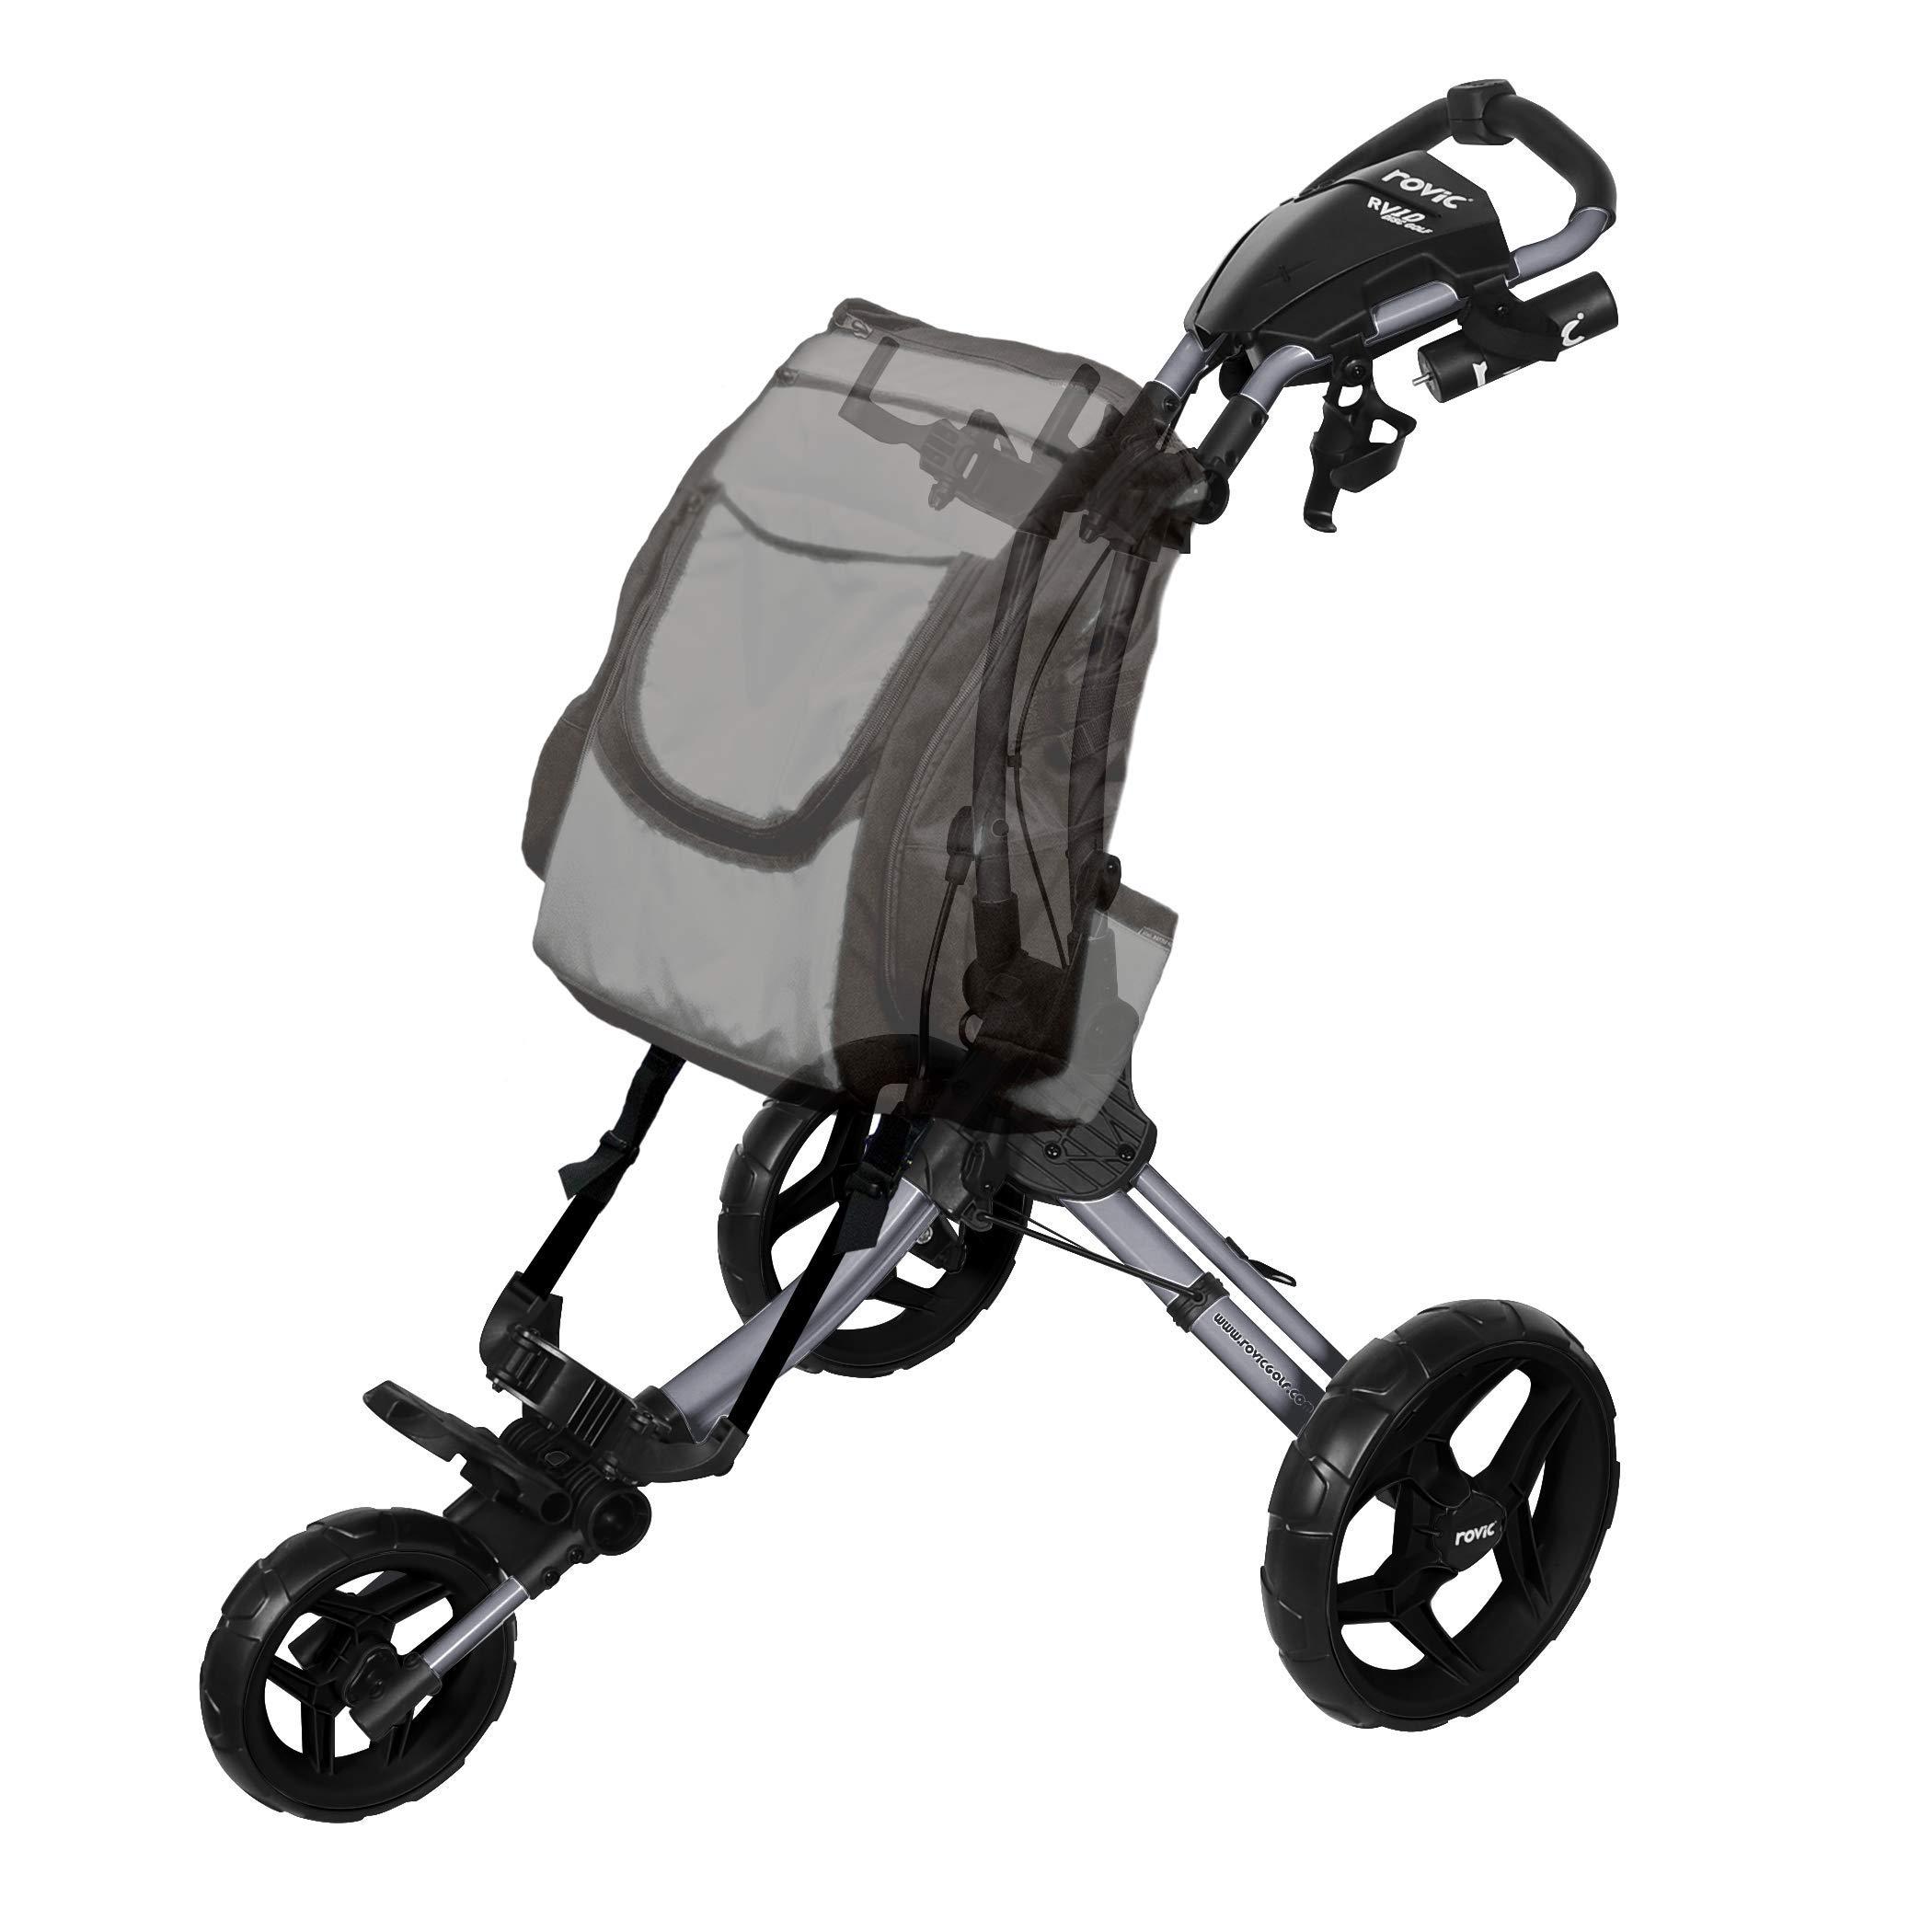 Rovic RV1D 3-Wheel Disc Golf Push Cart | Fits All Disc Golf Backpacks (Silver/Black) by Rovic